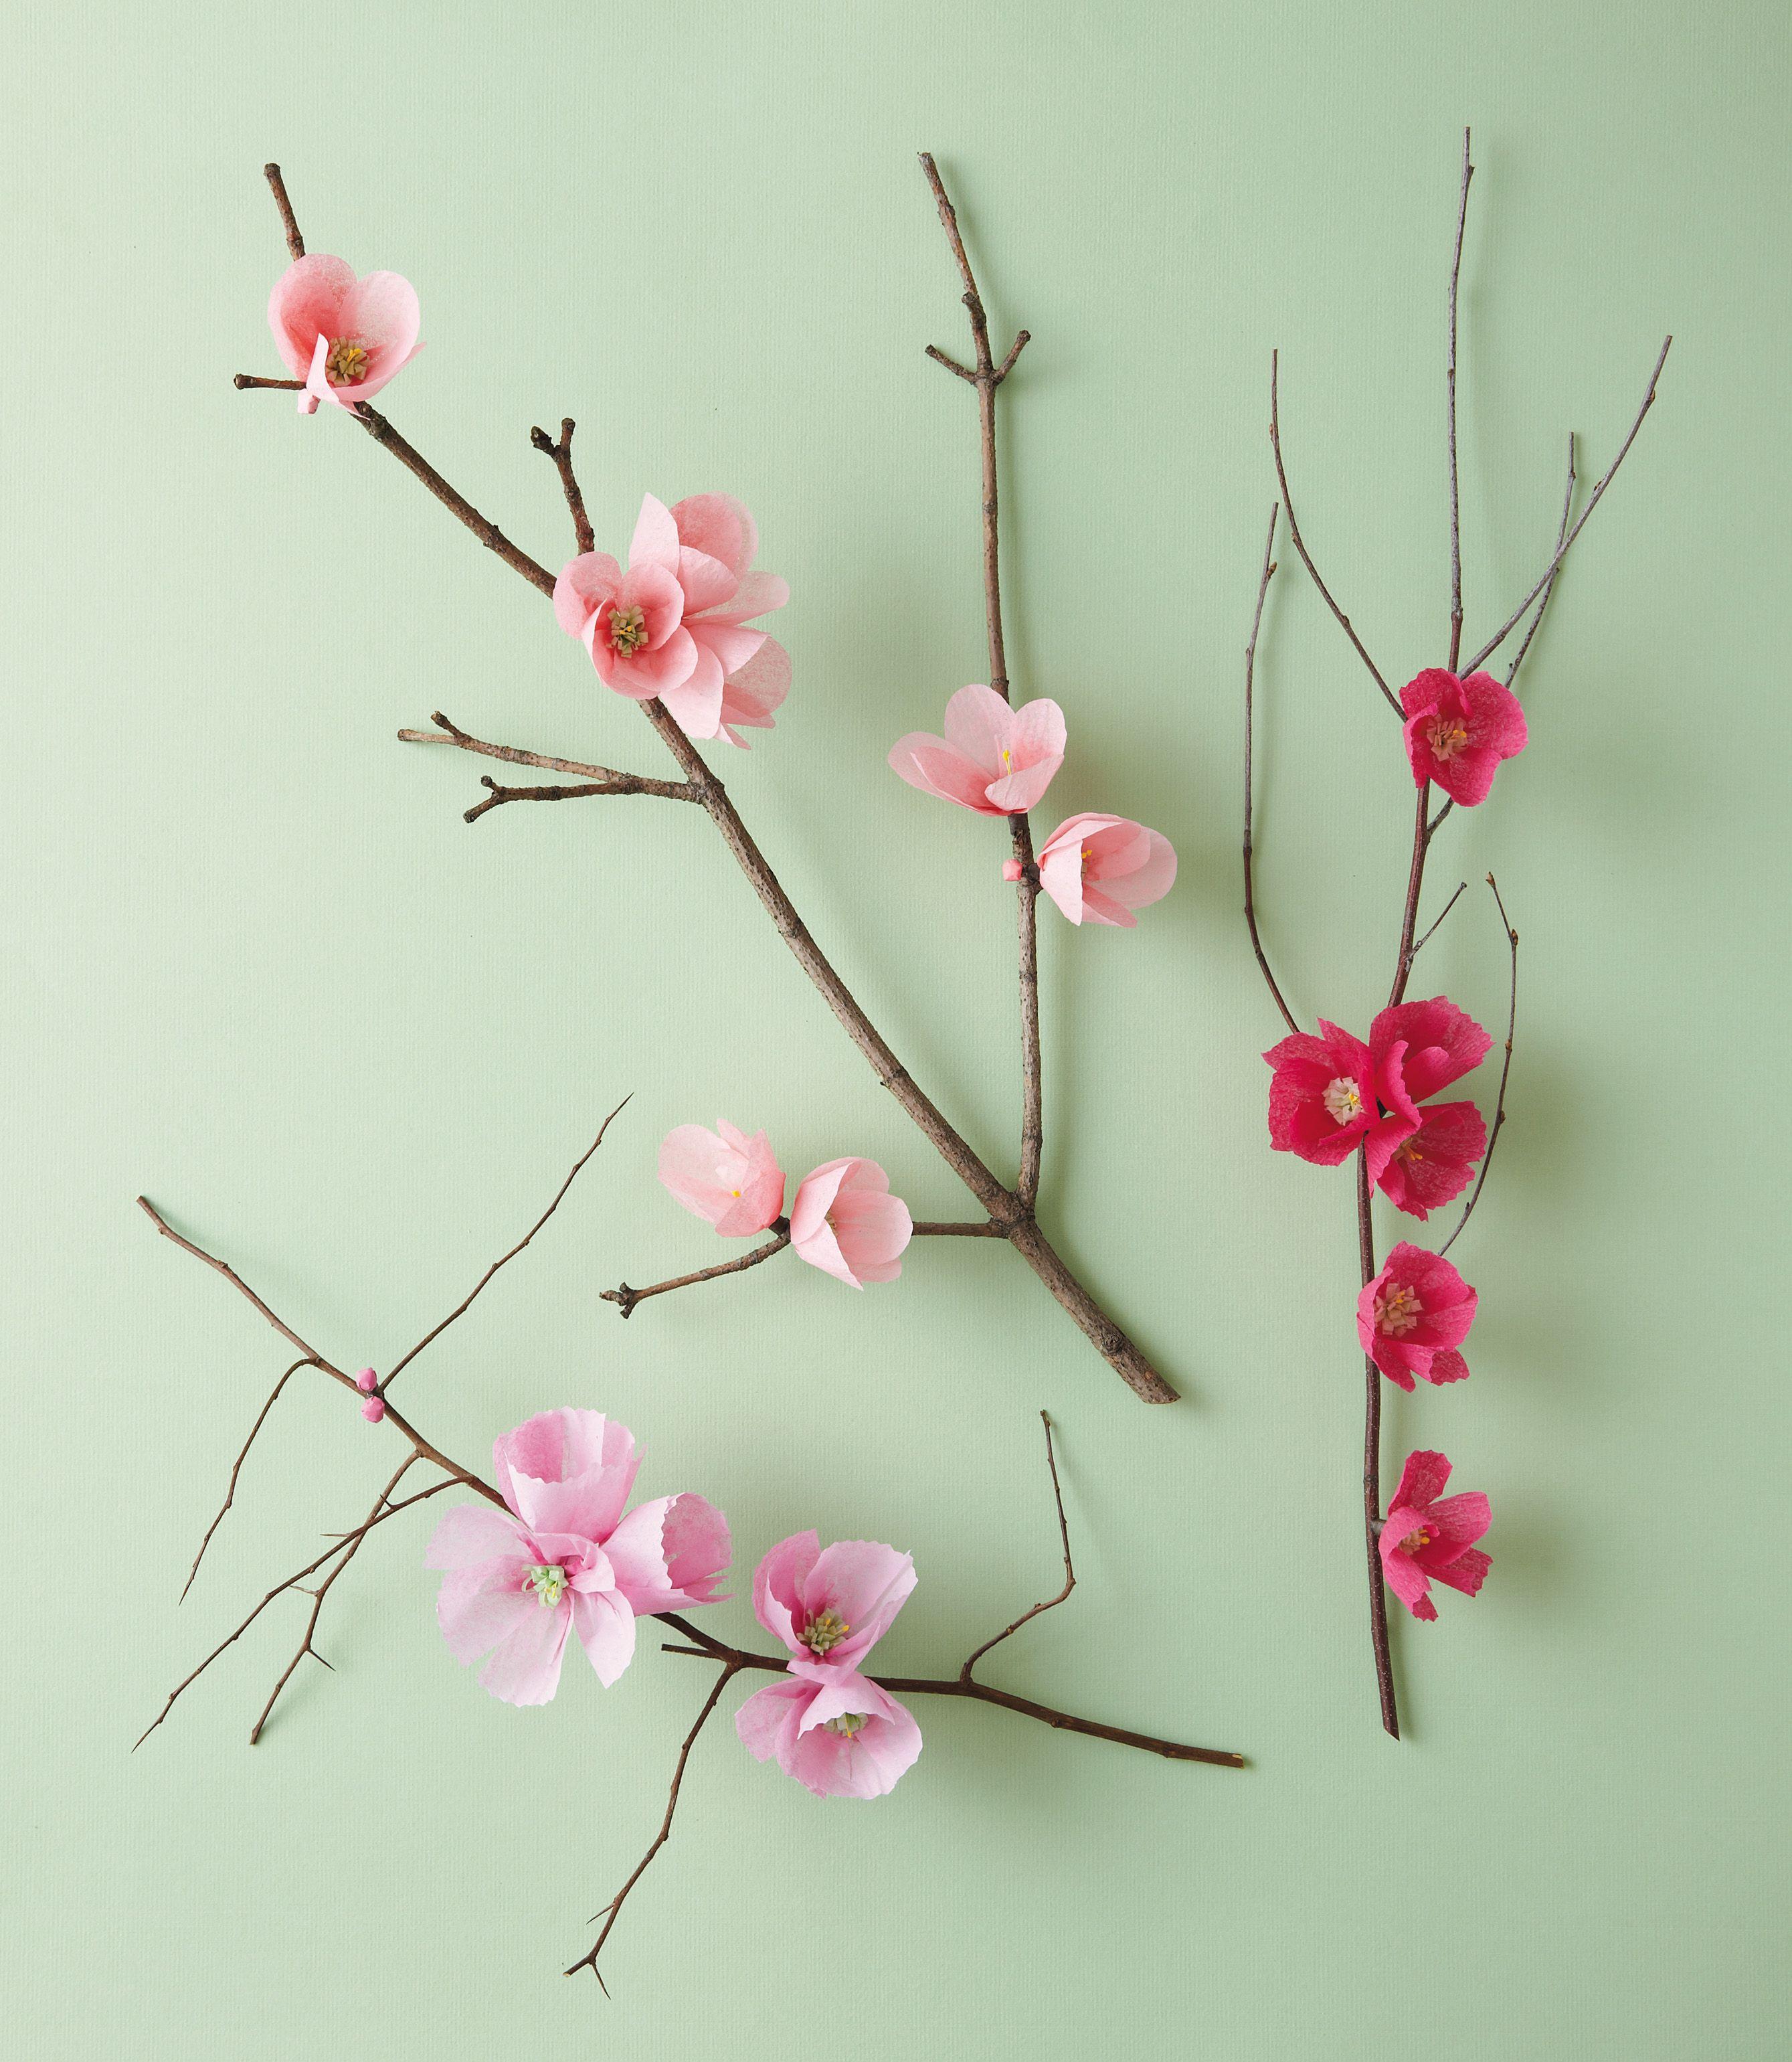 Exquisite Book Of Paper Flowers Exquisite Book Of Paper Flowers